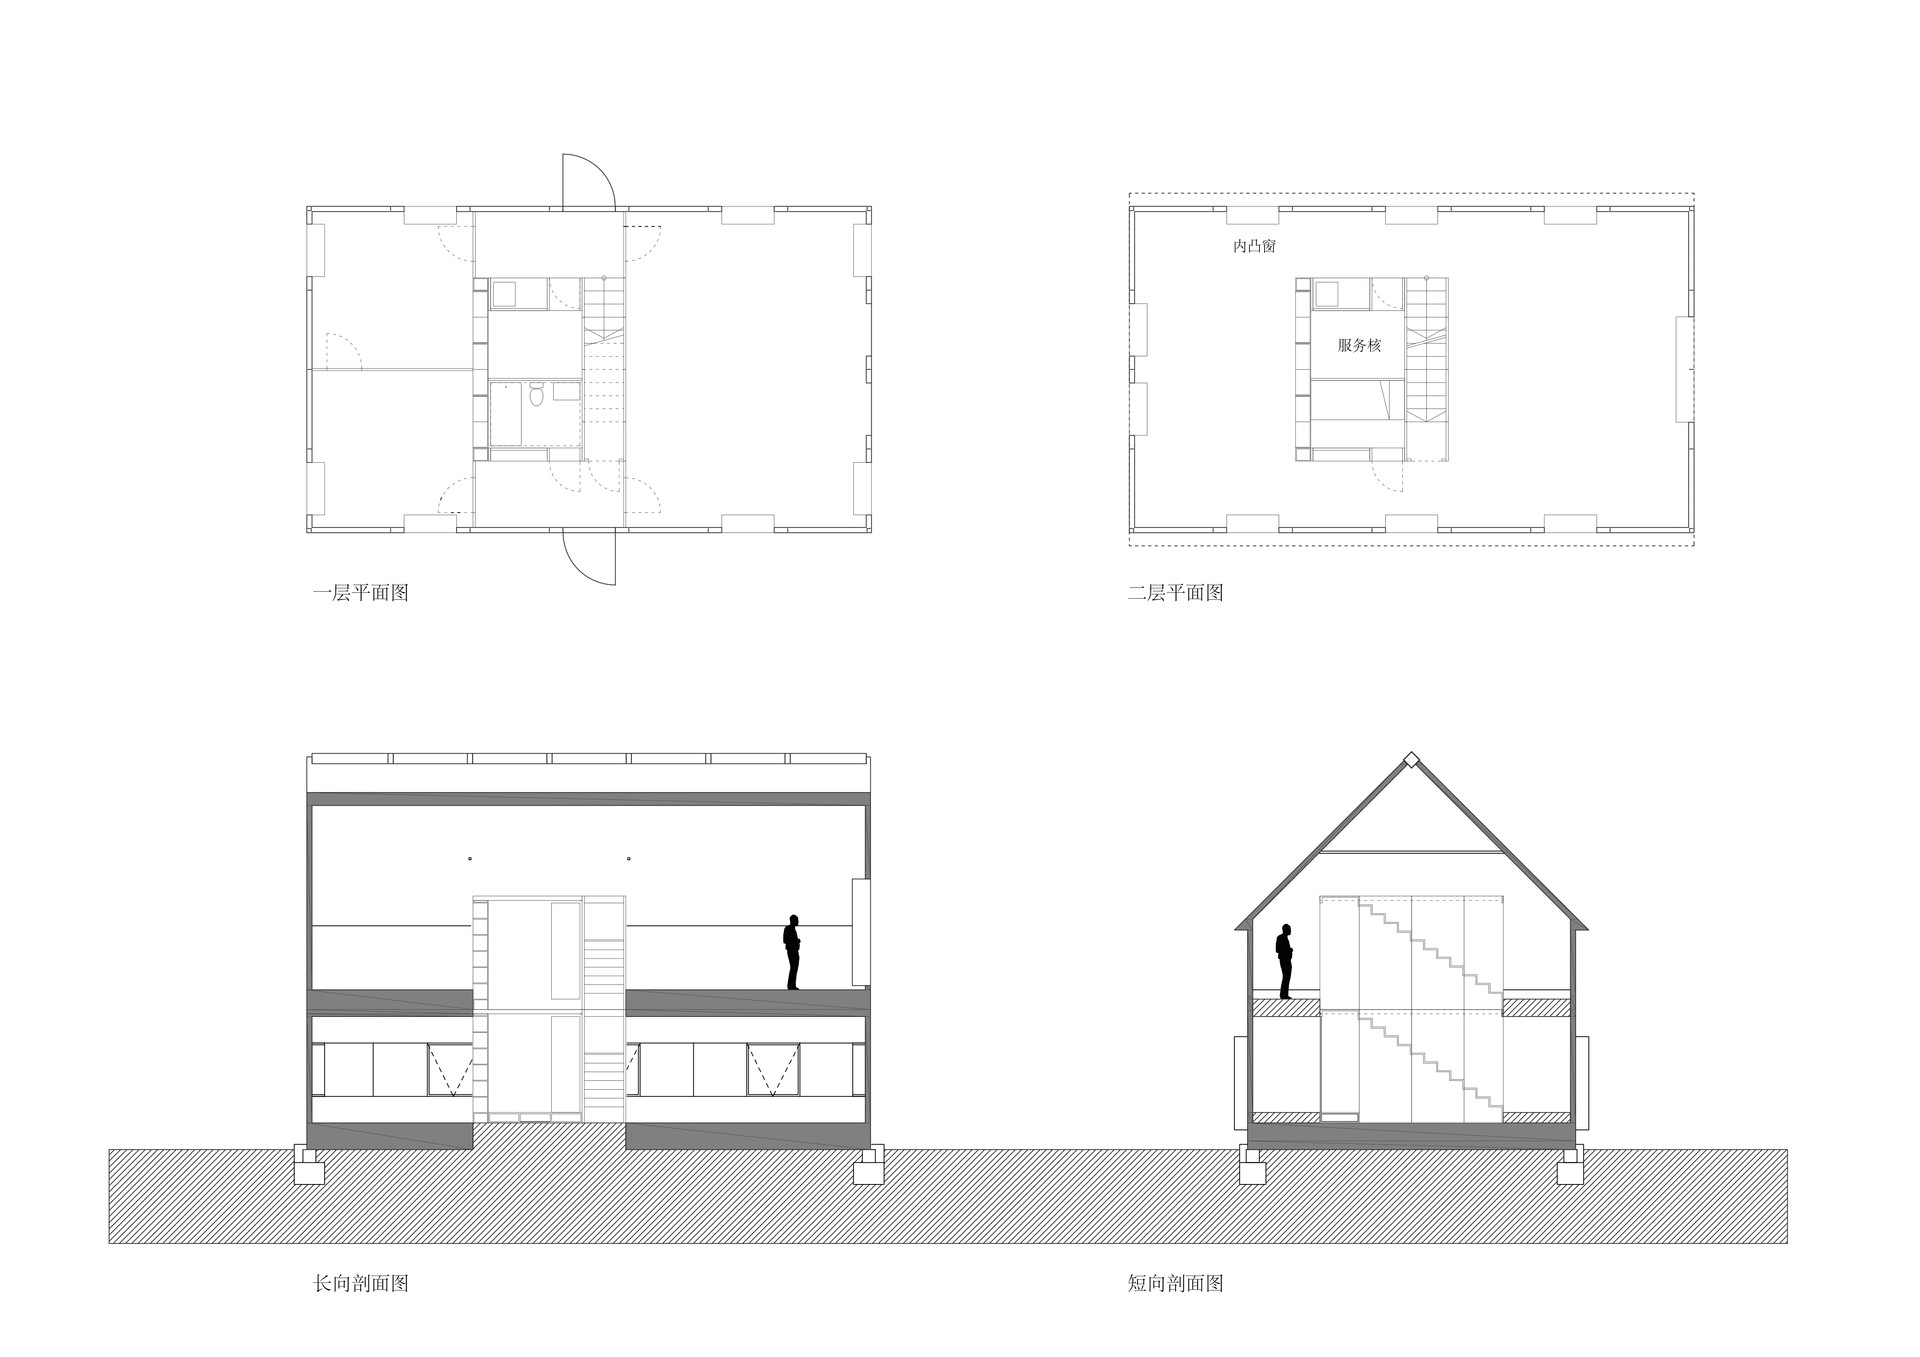 P13-XZB-Plan-Section.jpg